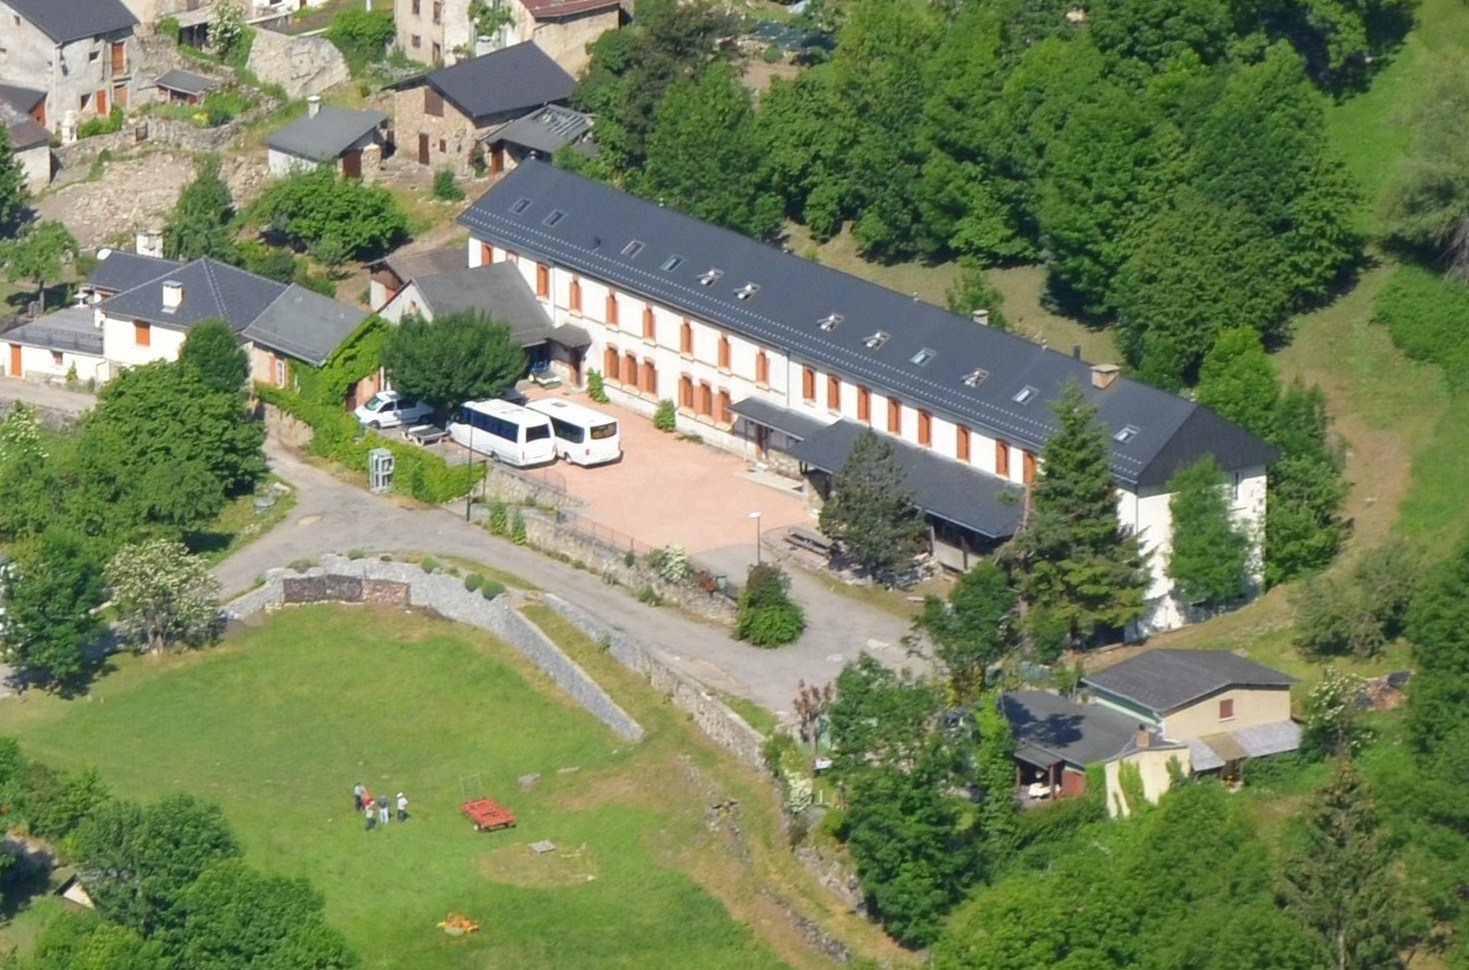 Centre permanent vu d_Helicoptere.JPG